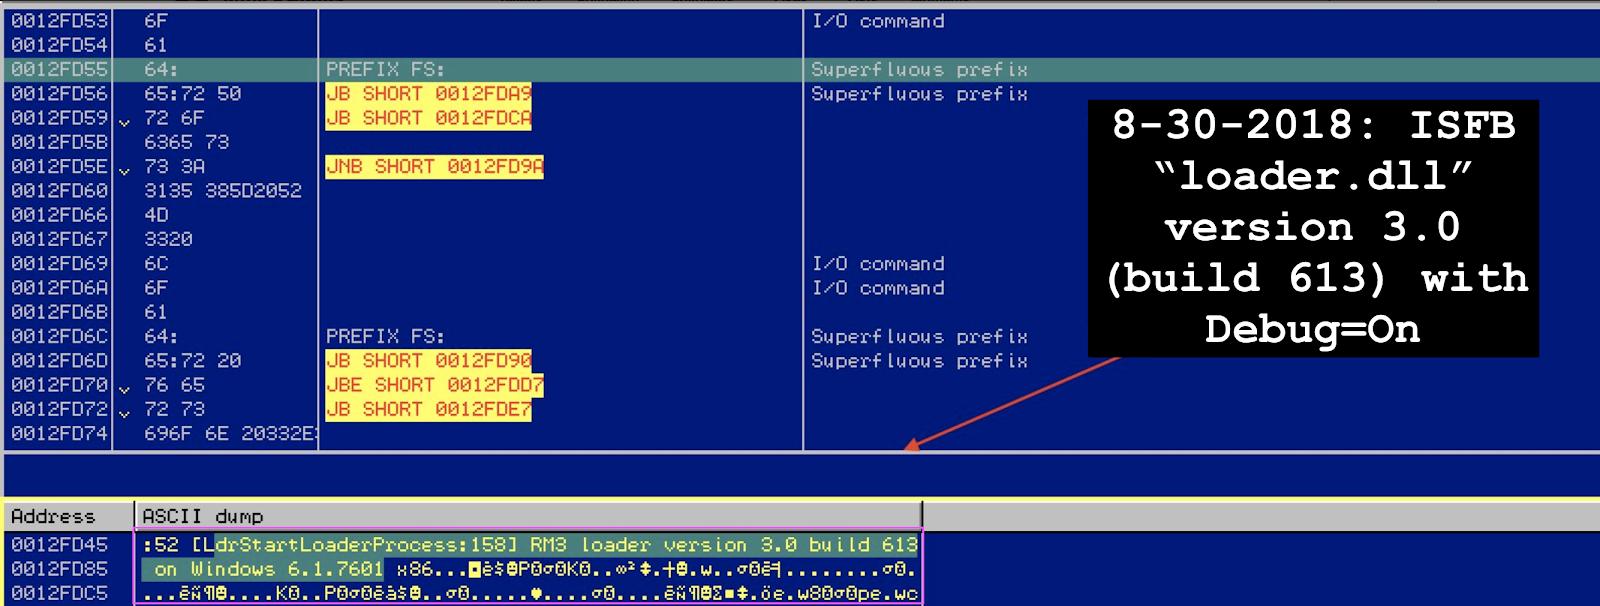 Let's Learn: In-Depth Reversing of Recent Gozi ISFB Banking Malware